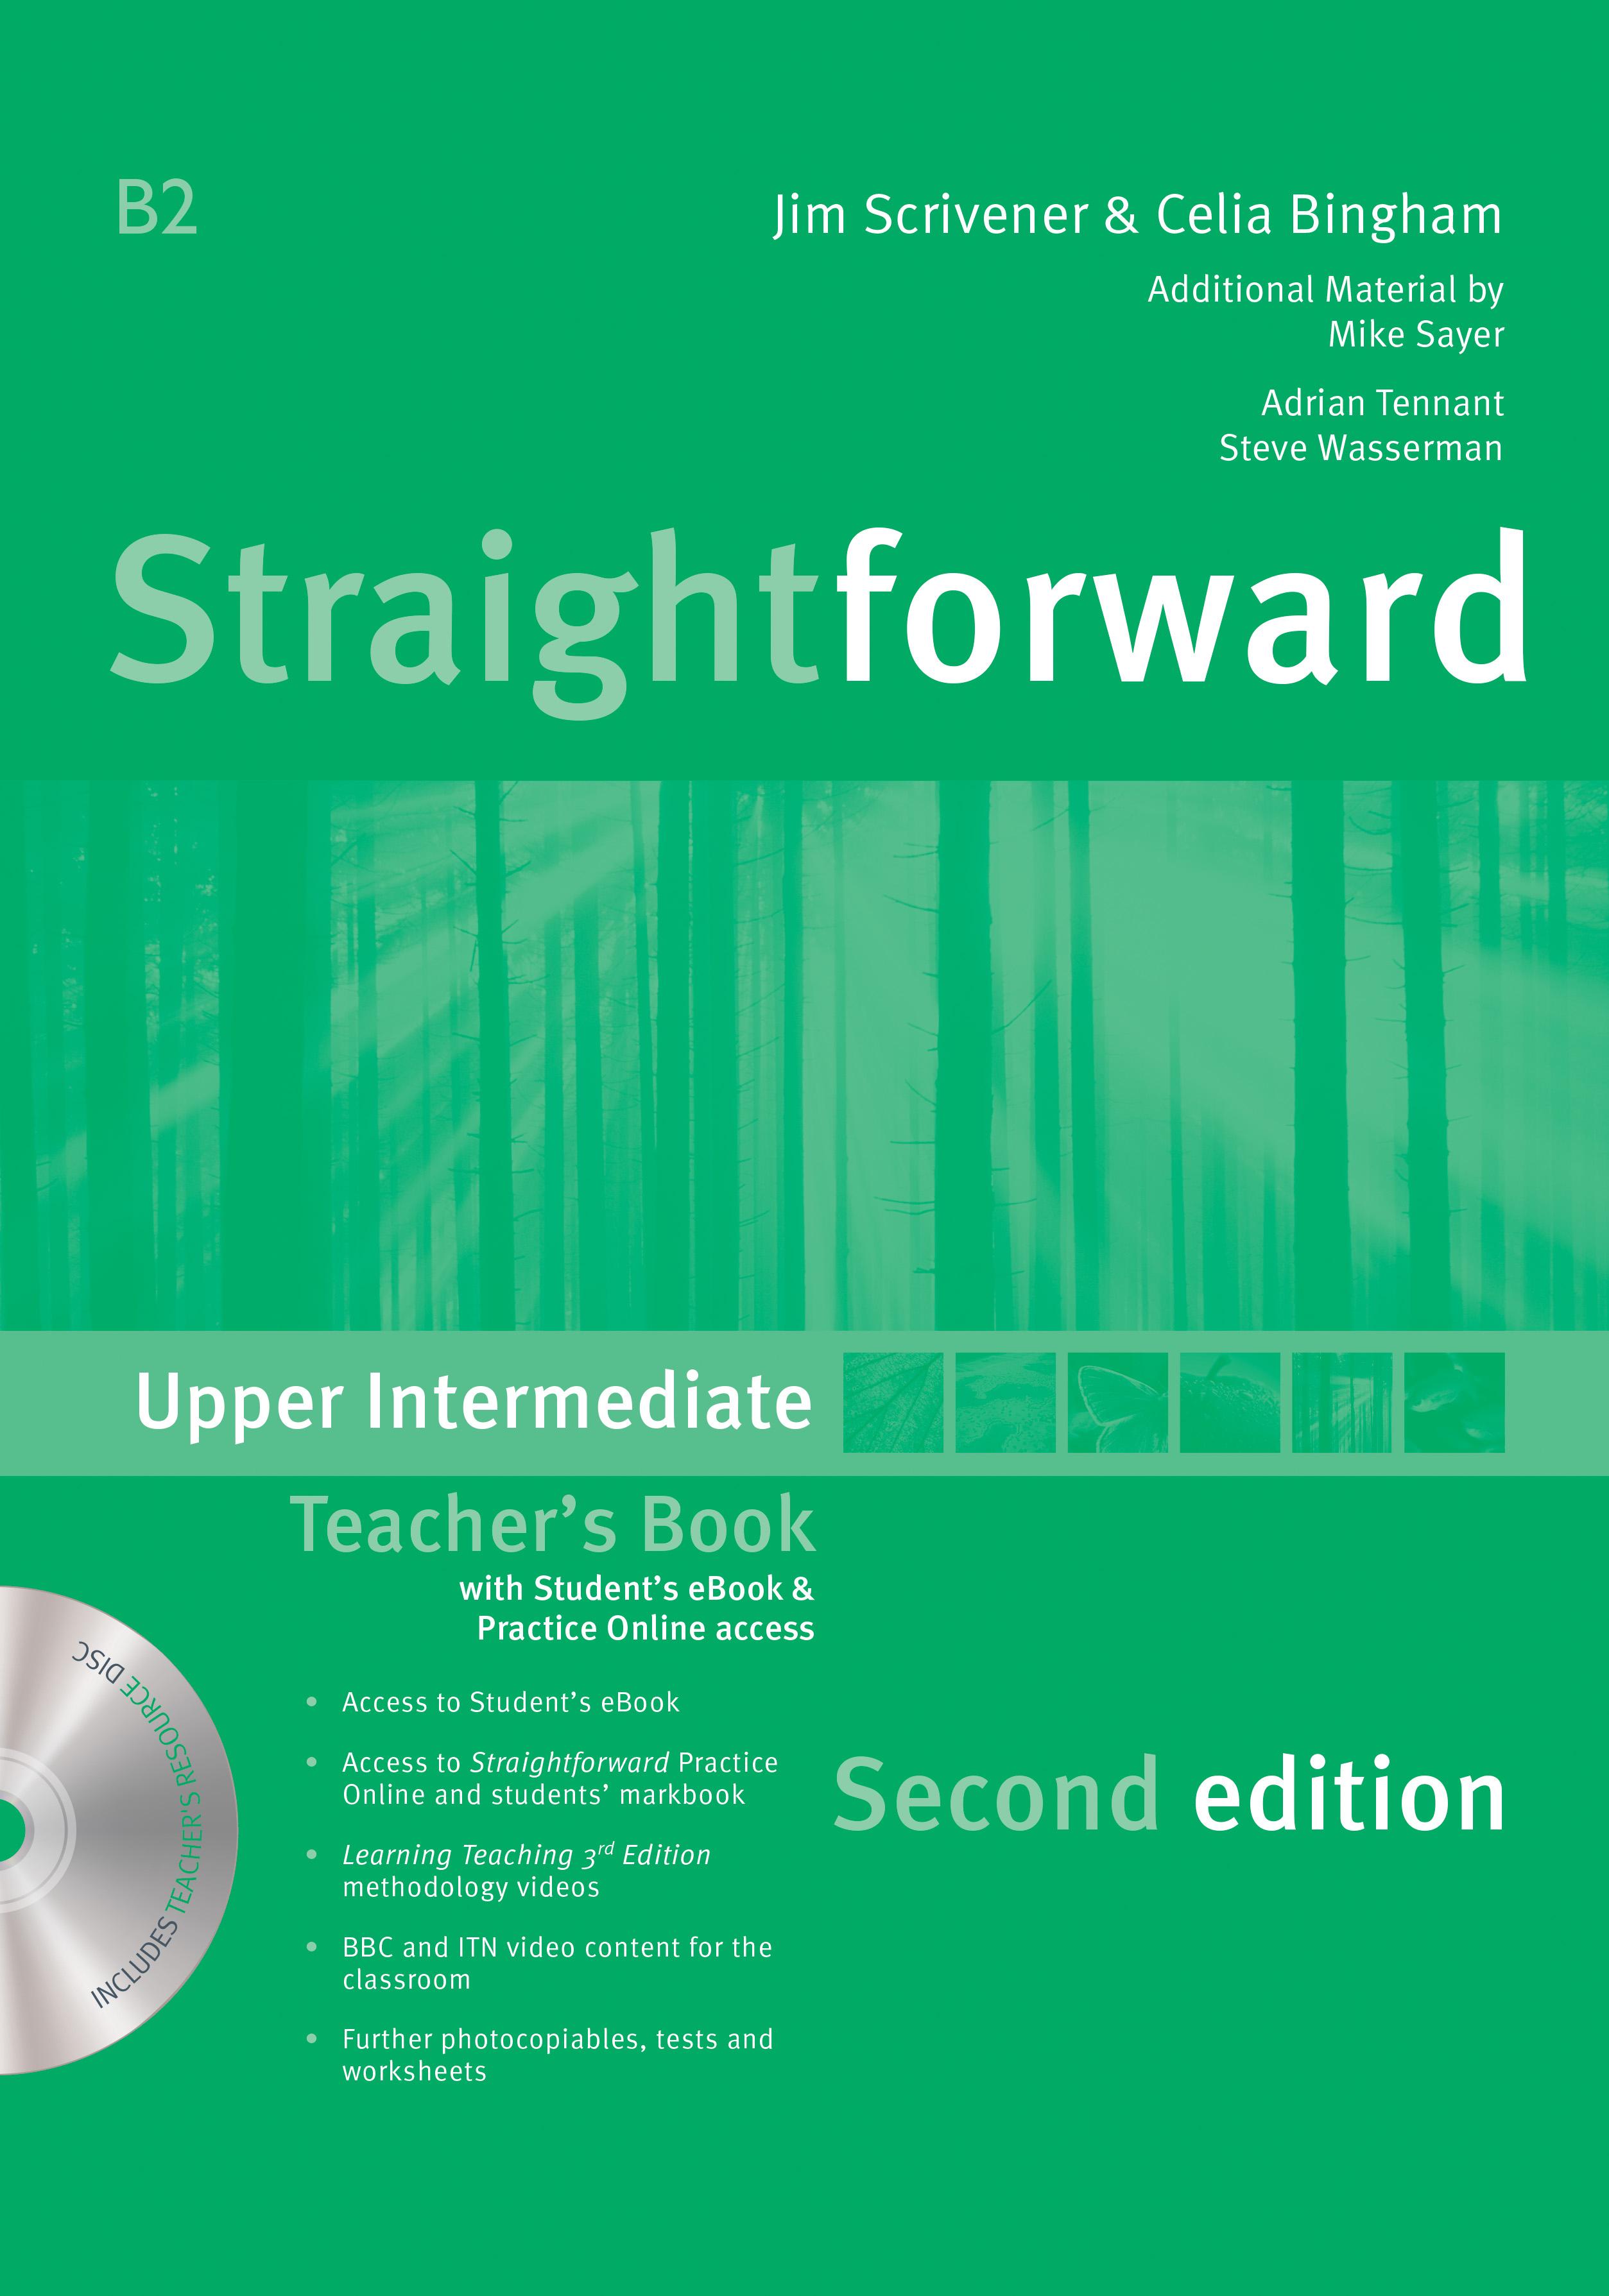 Straightforward 2nd Edition Upper Intermediate + eBook Teacher